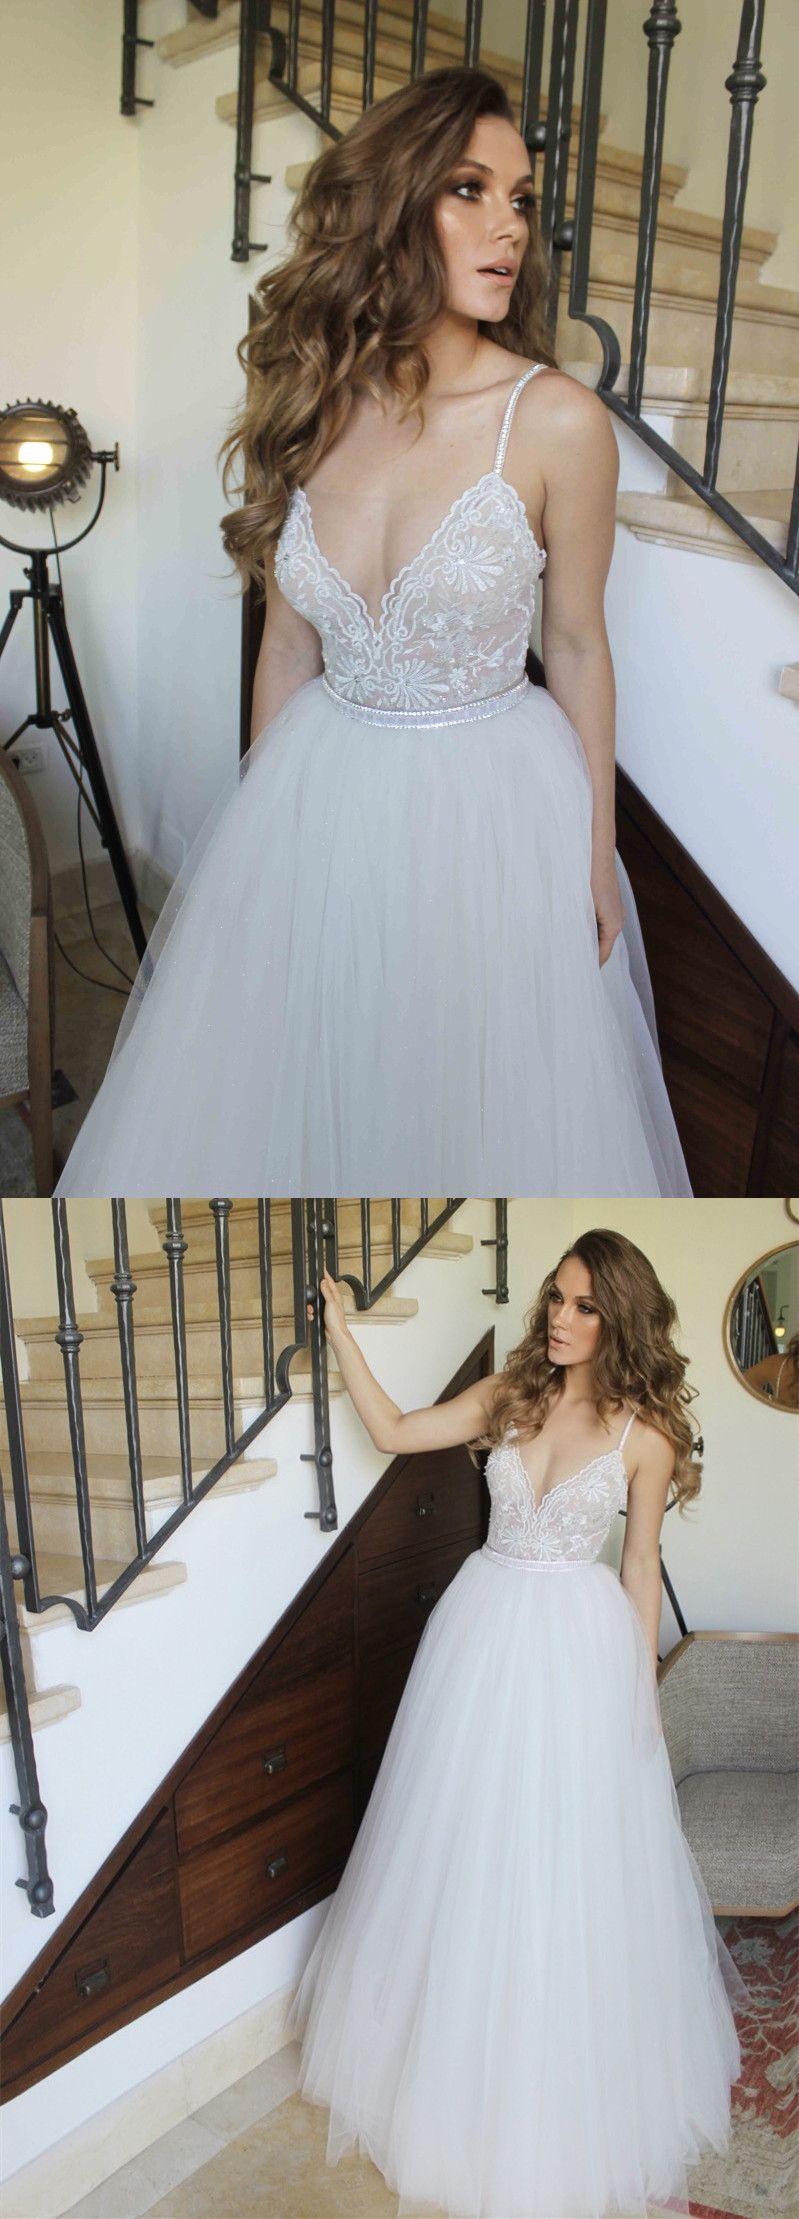 white long prom dress, 2018 prom dress, straps white long prom dress ...